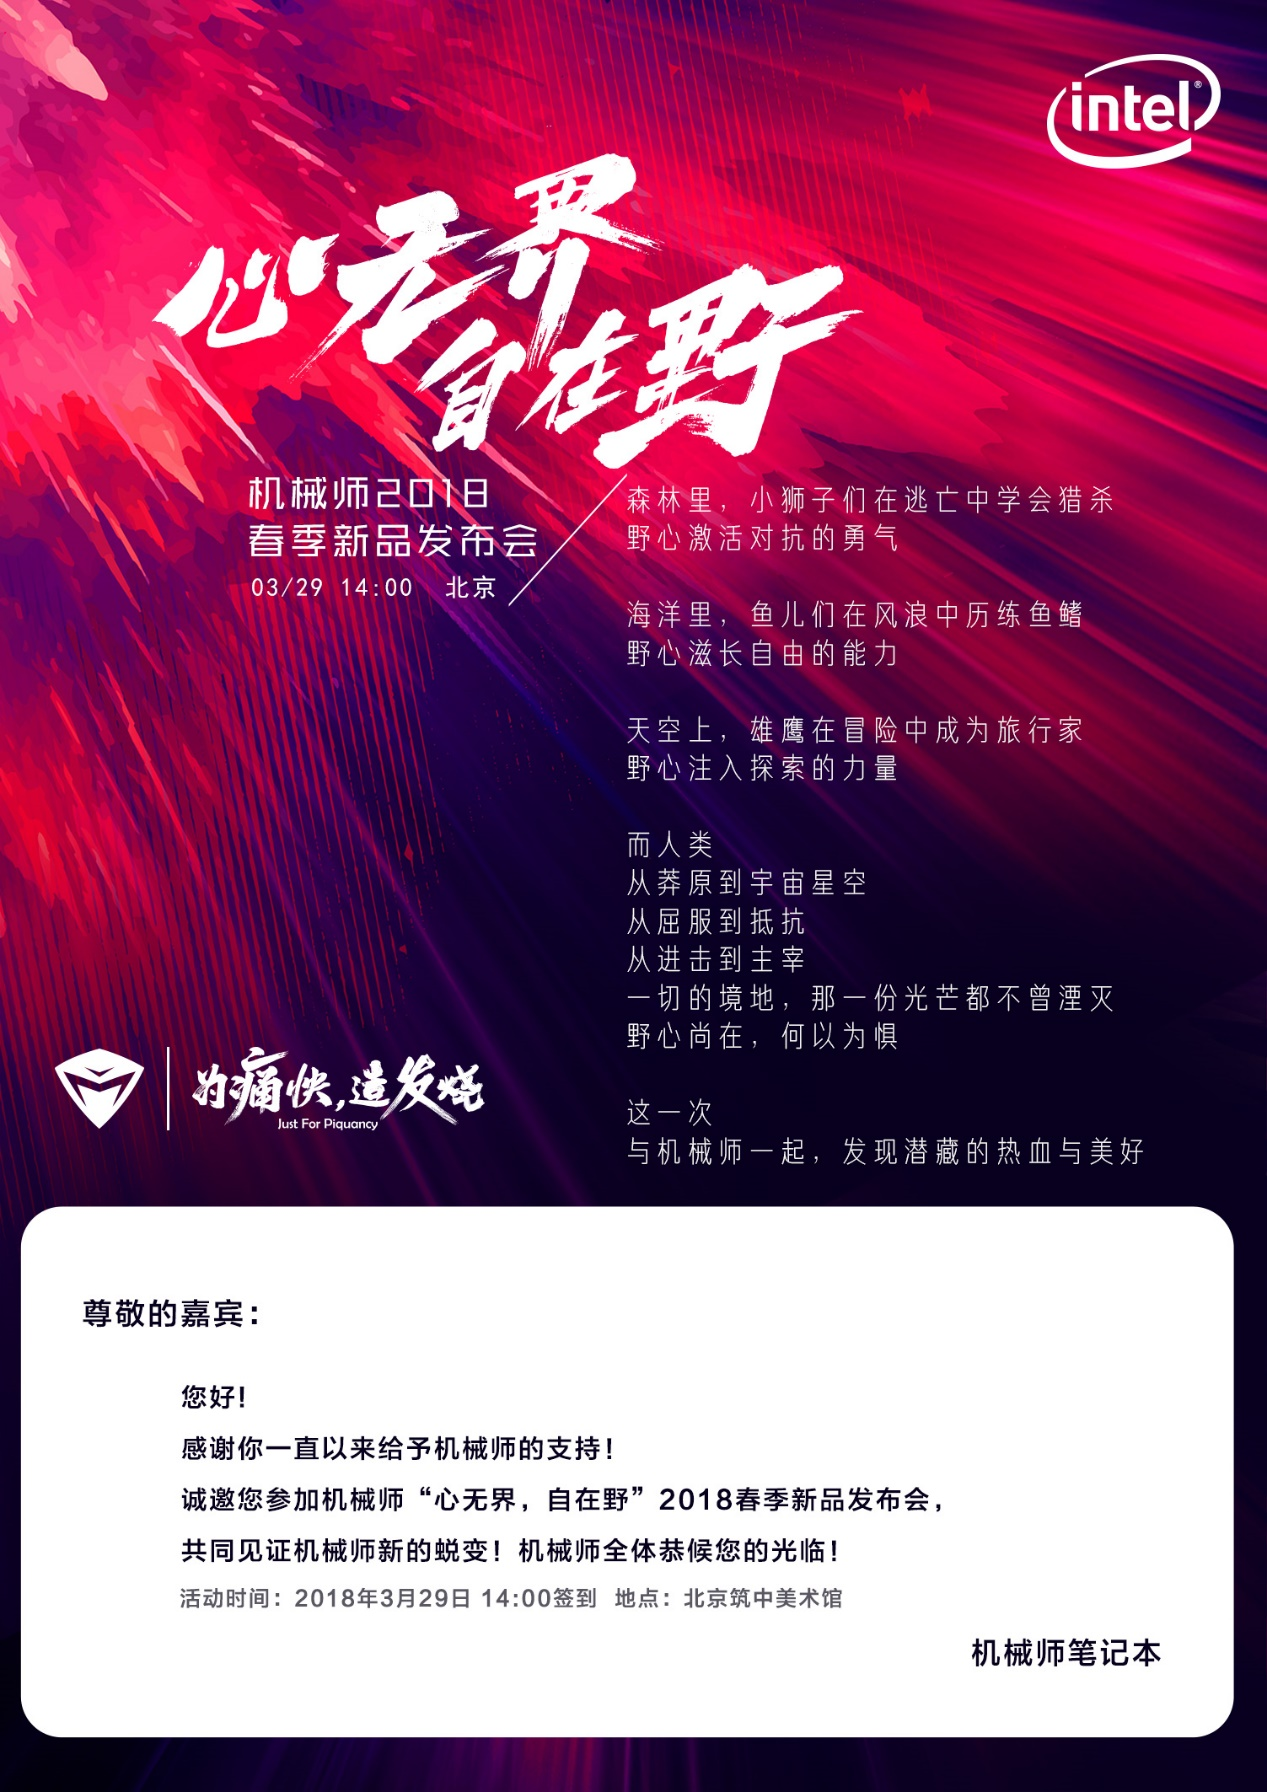 C:\Users\养了一群马杀鸡\Documents\Tencent Files\919097476\FileRecv\13X18cm正面.jpg